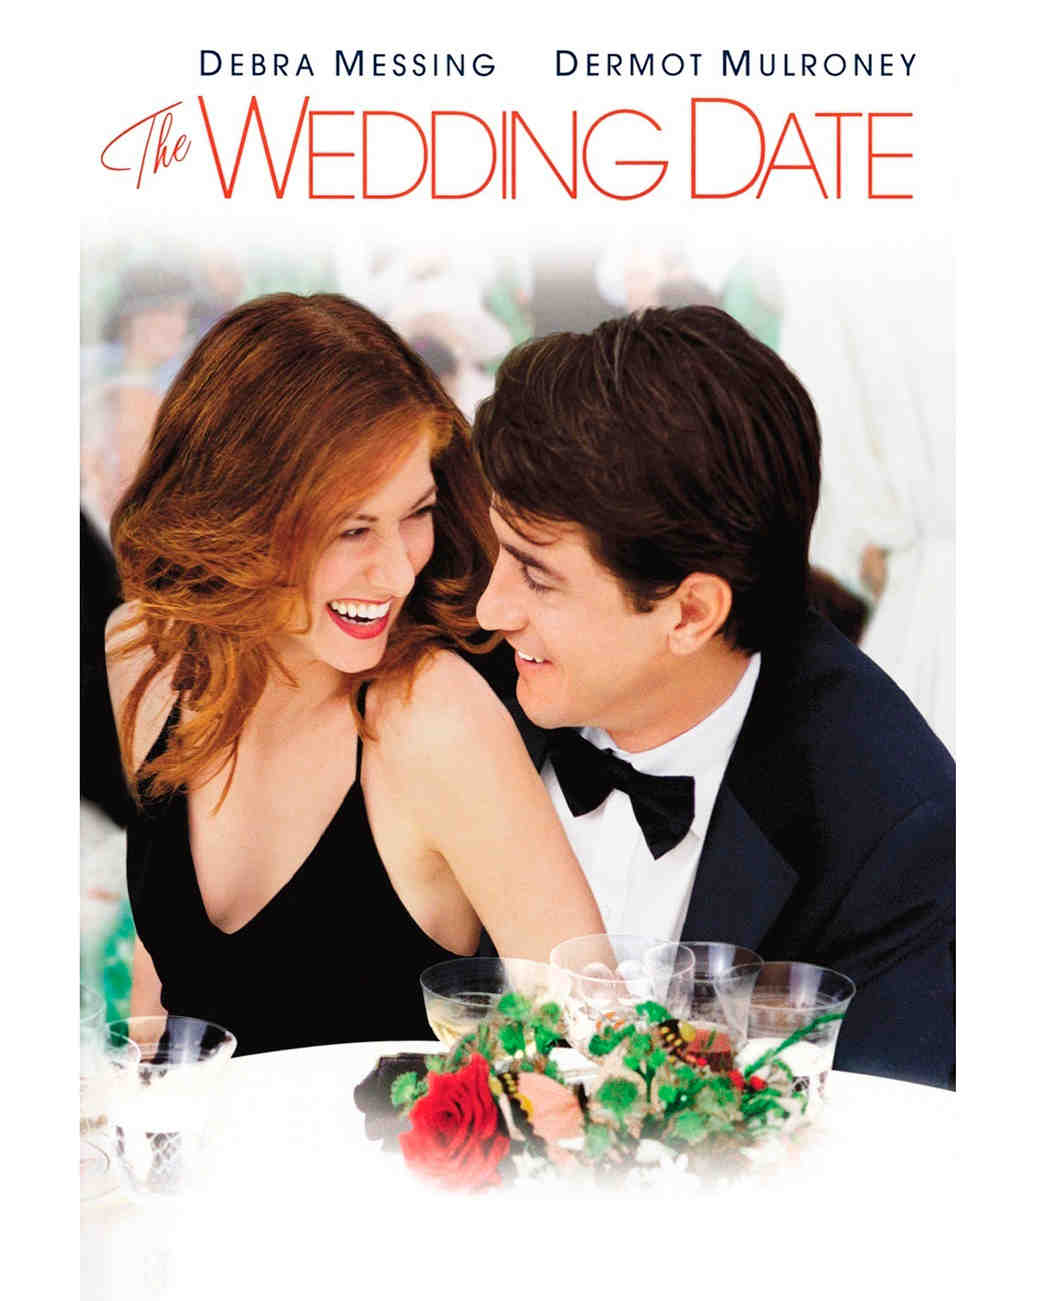 wedding-movies-wedding-date-1115.jpg